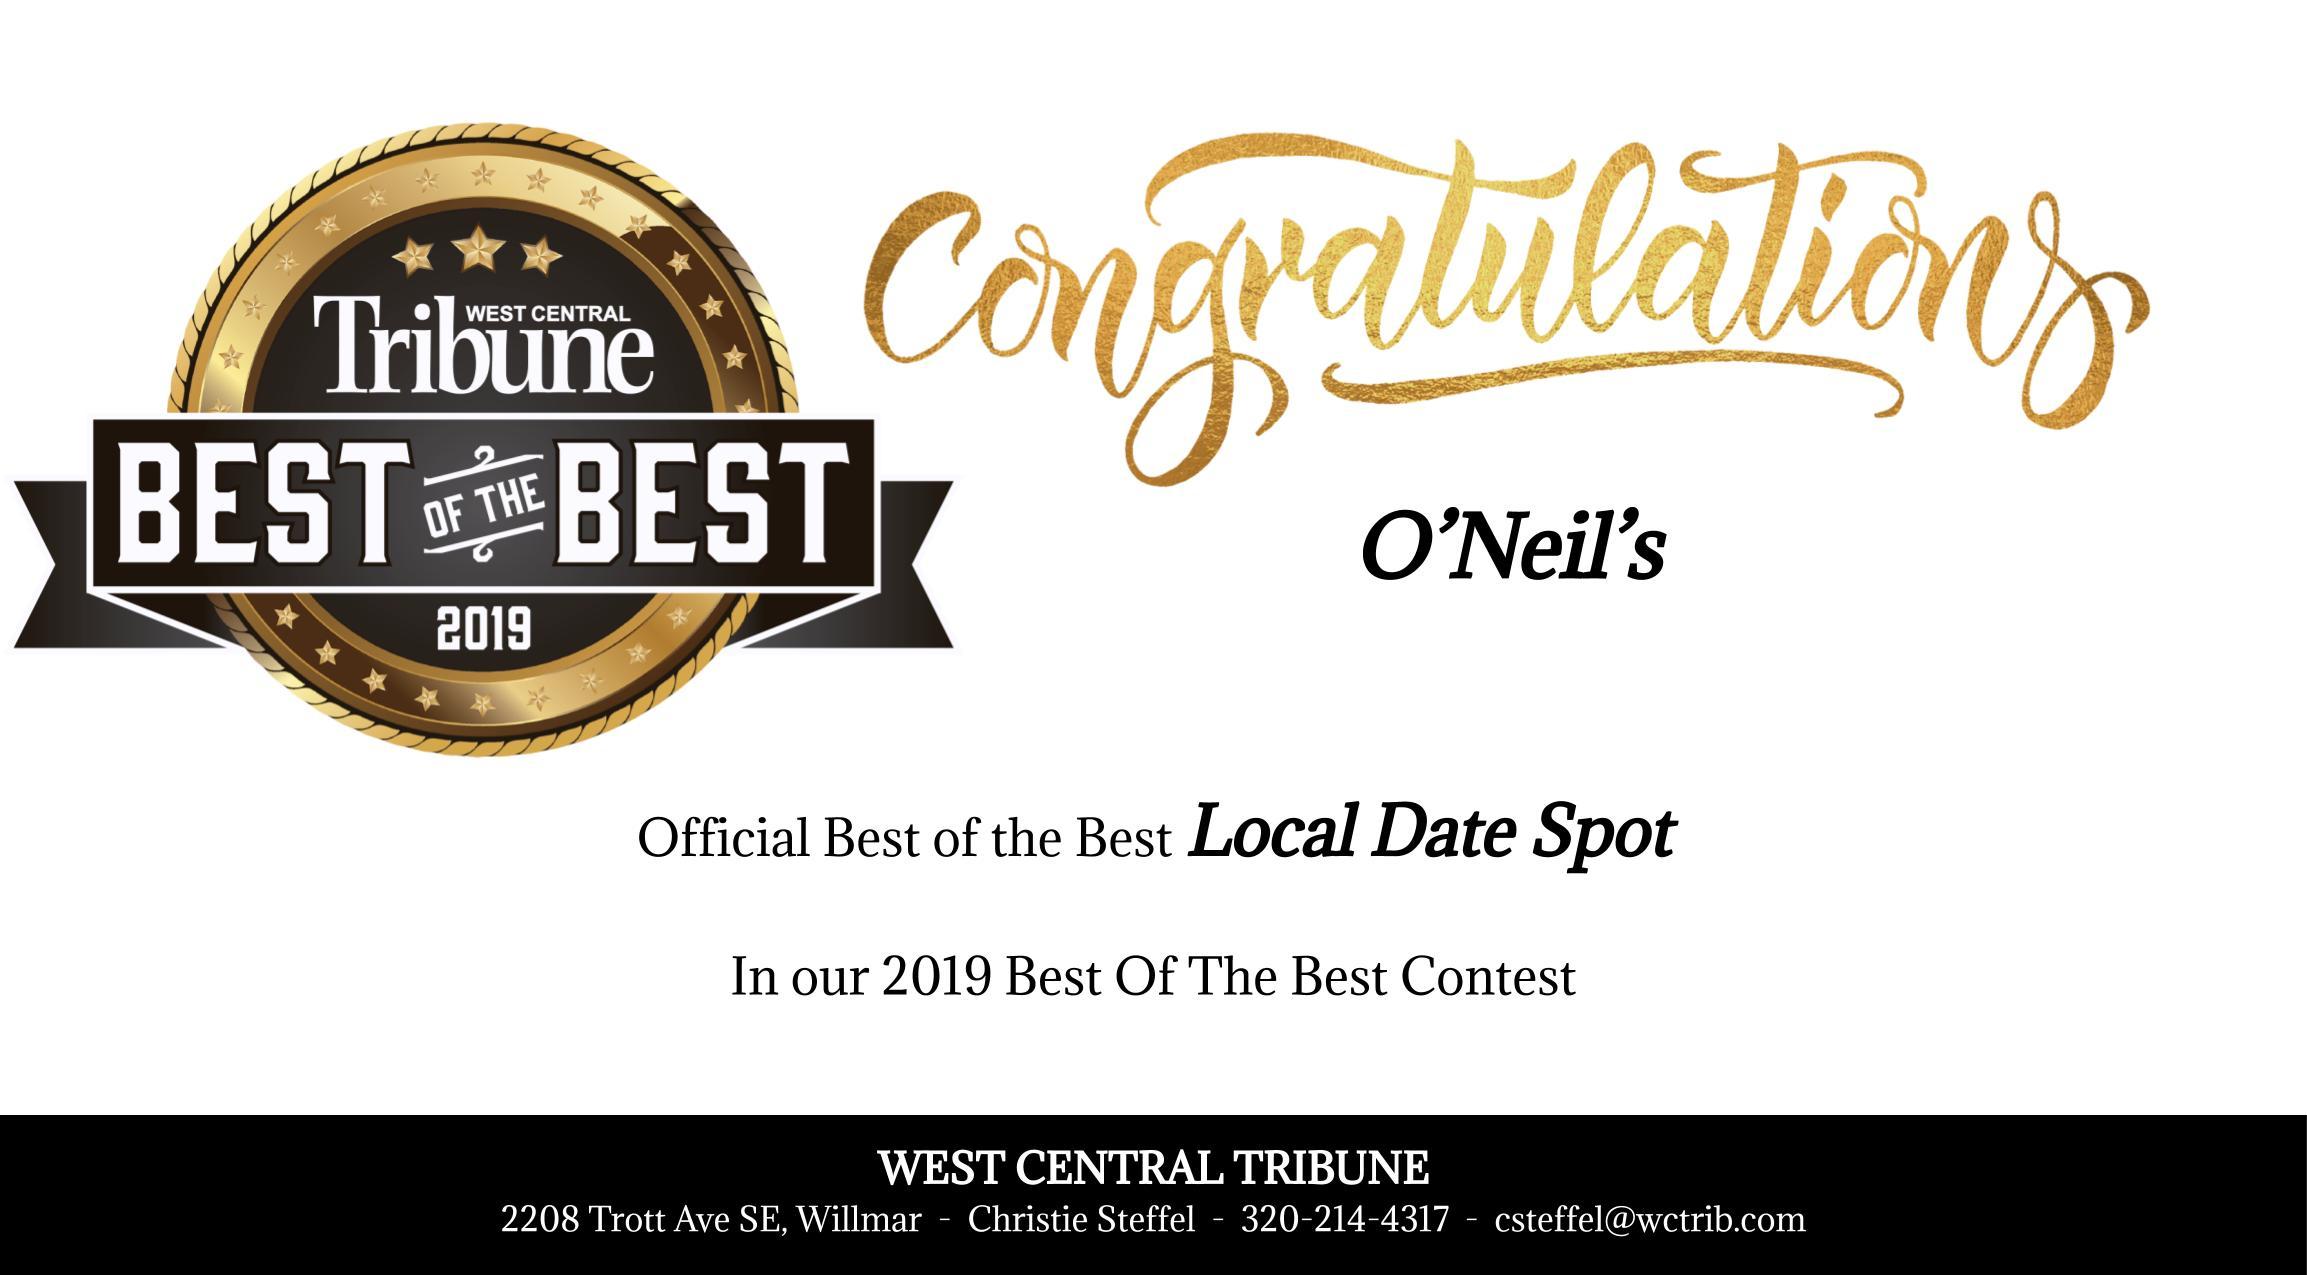 O'Neil's - Local Date Spot.jpg